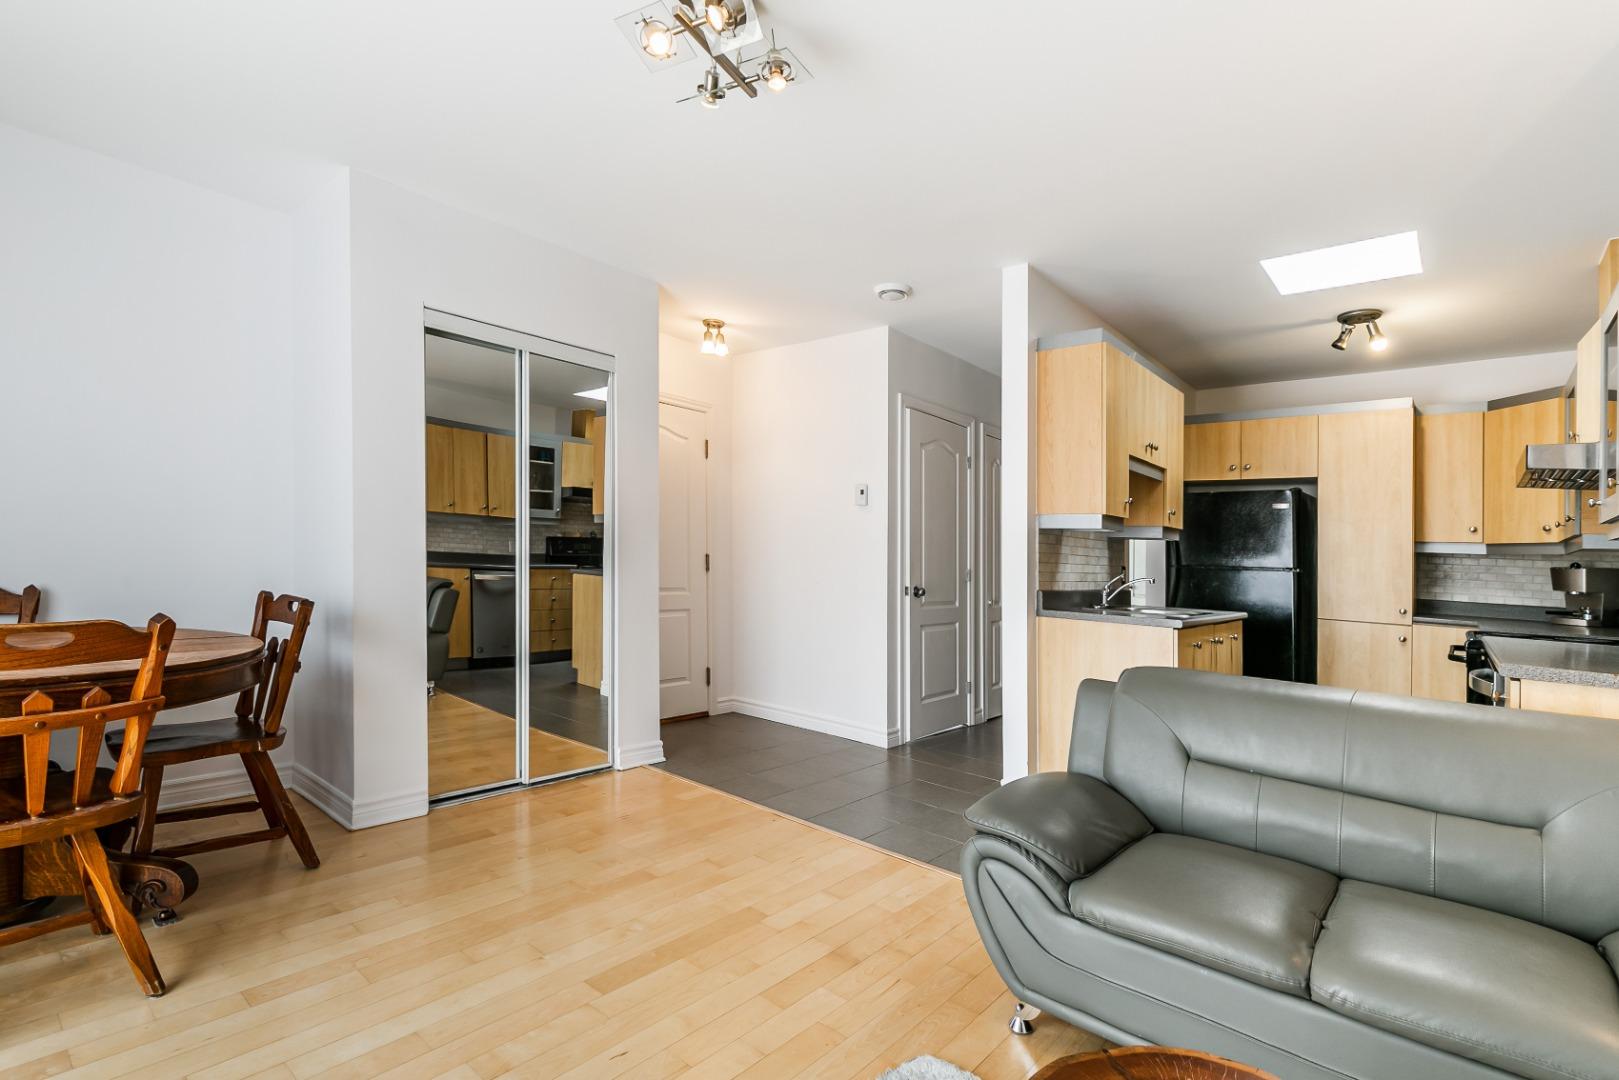 Condo à vendre Villeray 7547 Rue Lajeunesse (3).jpg